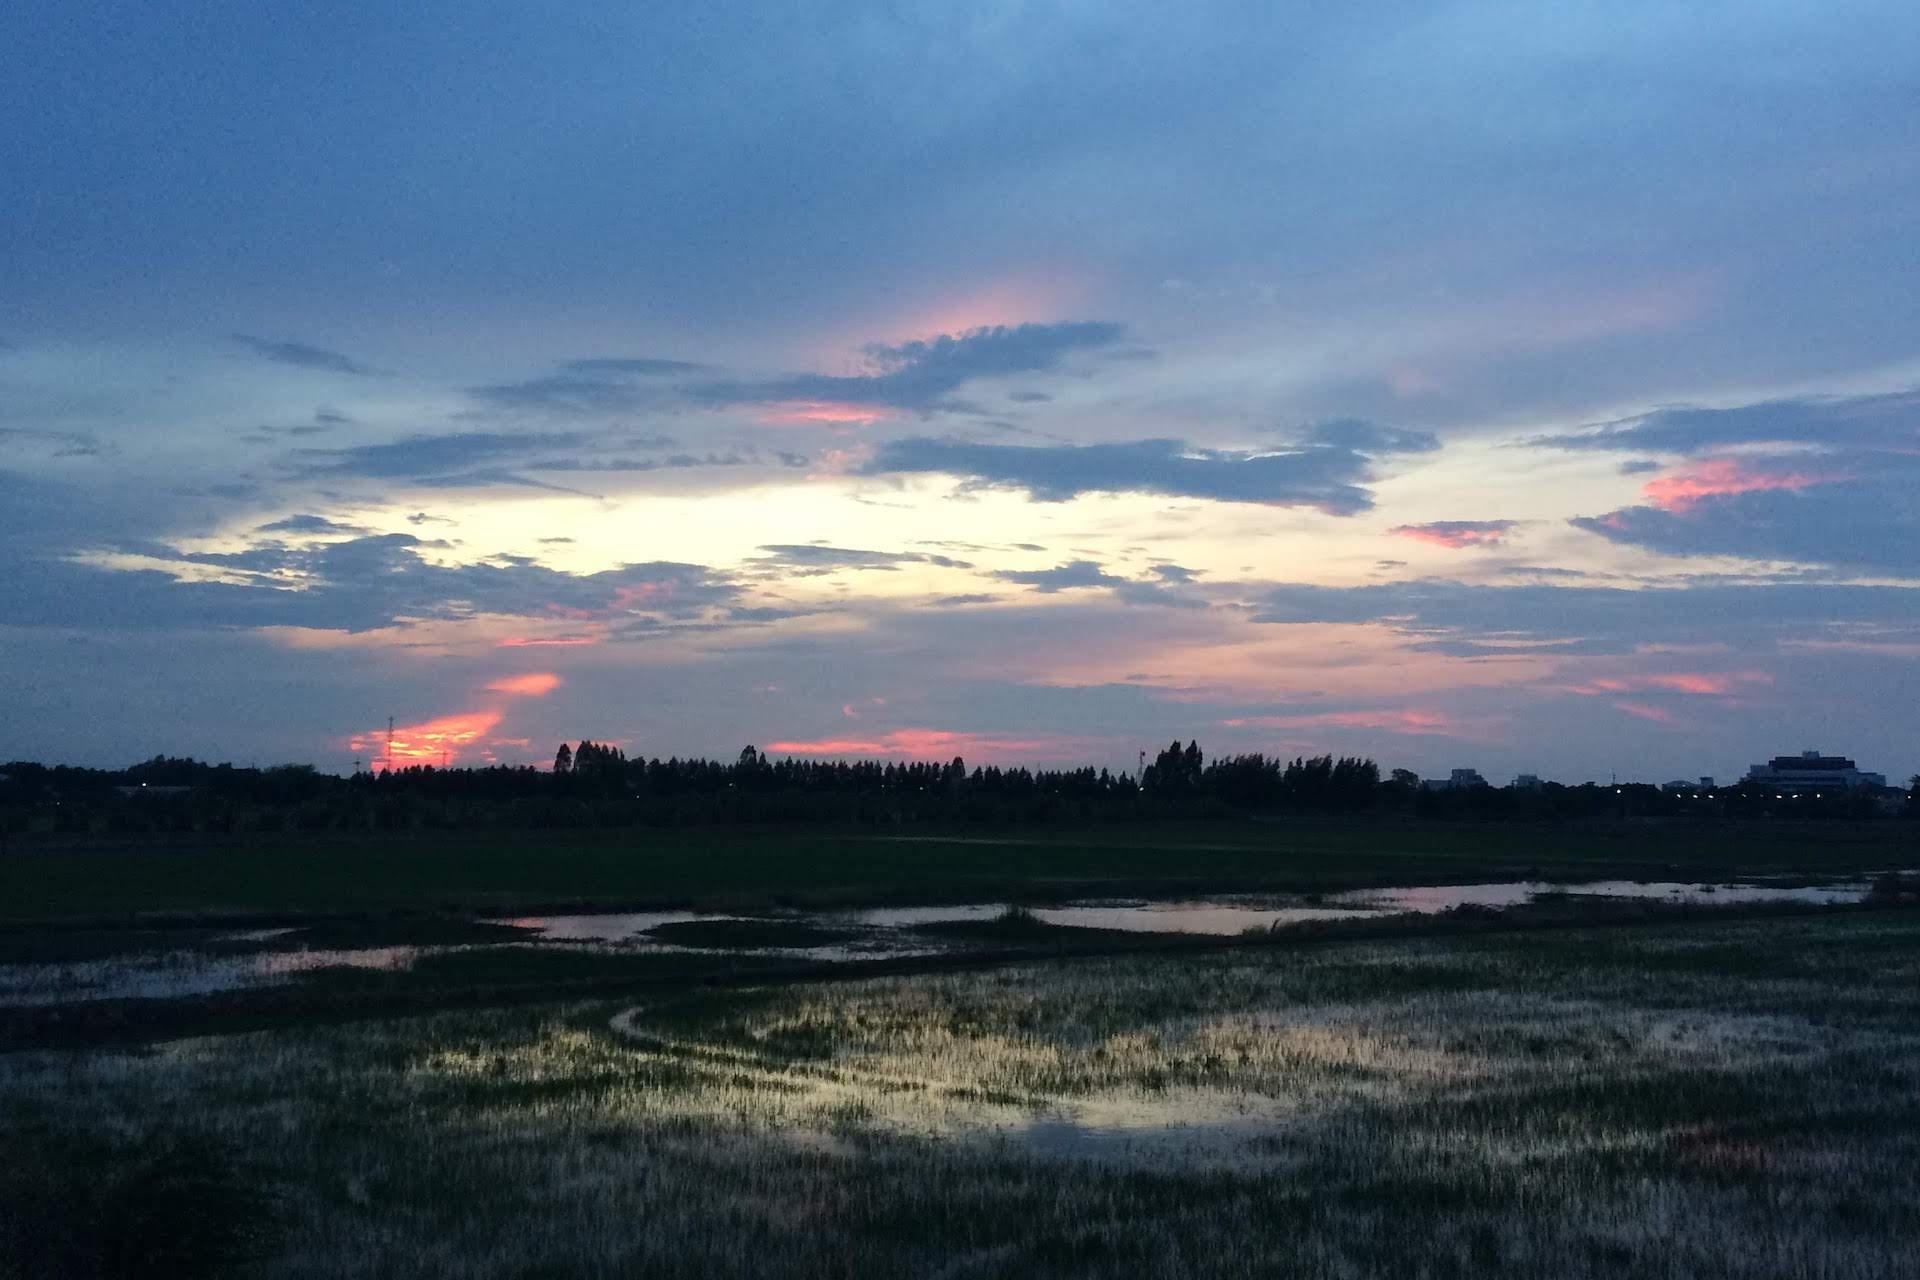 západ slunce nad rýžovými poli